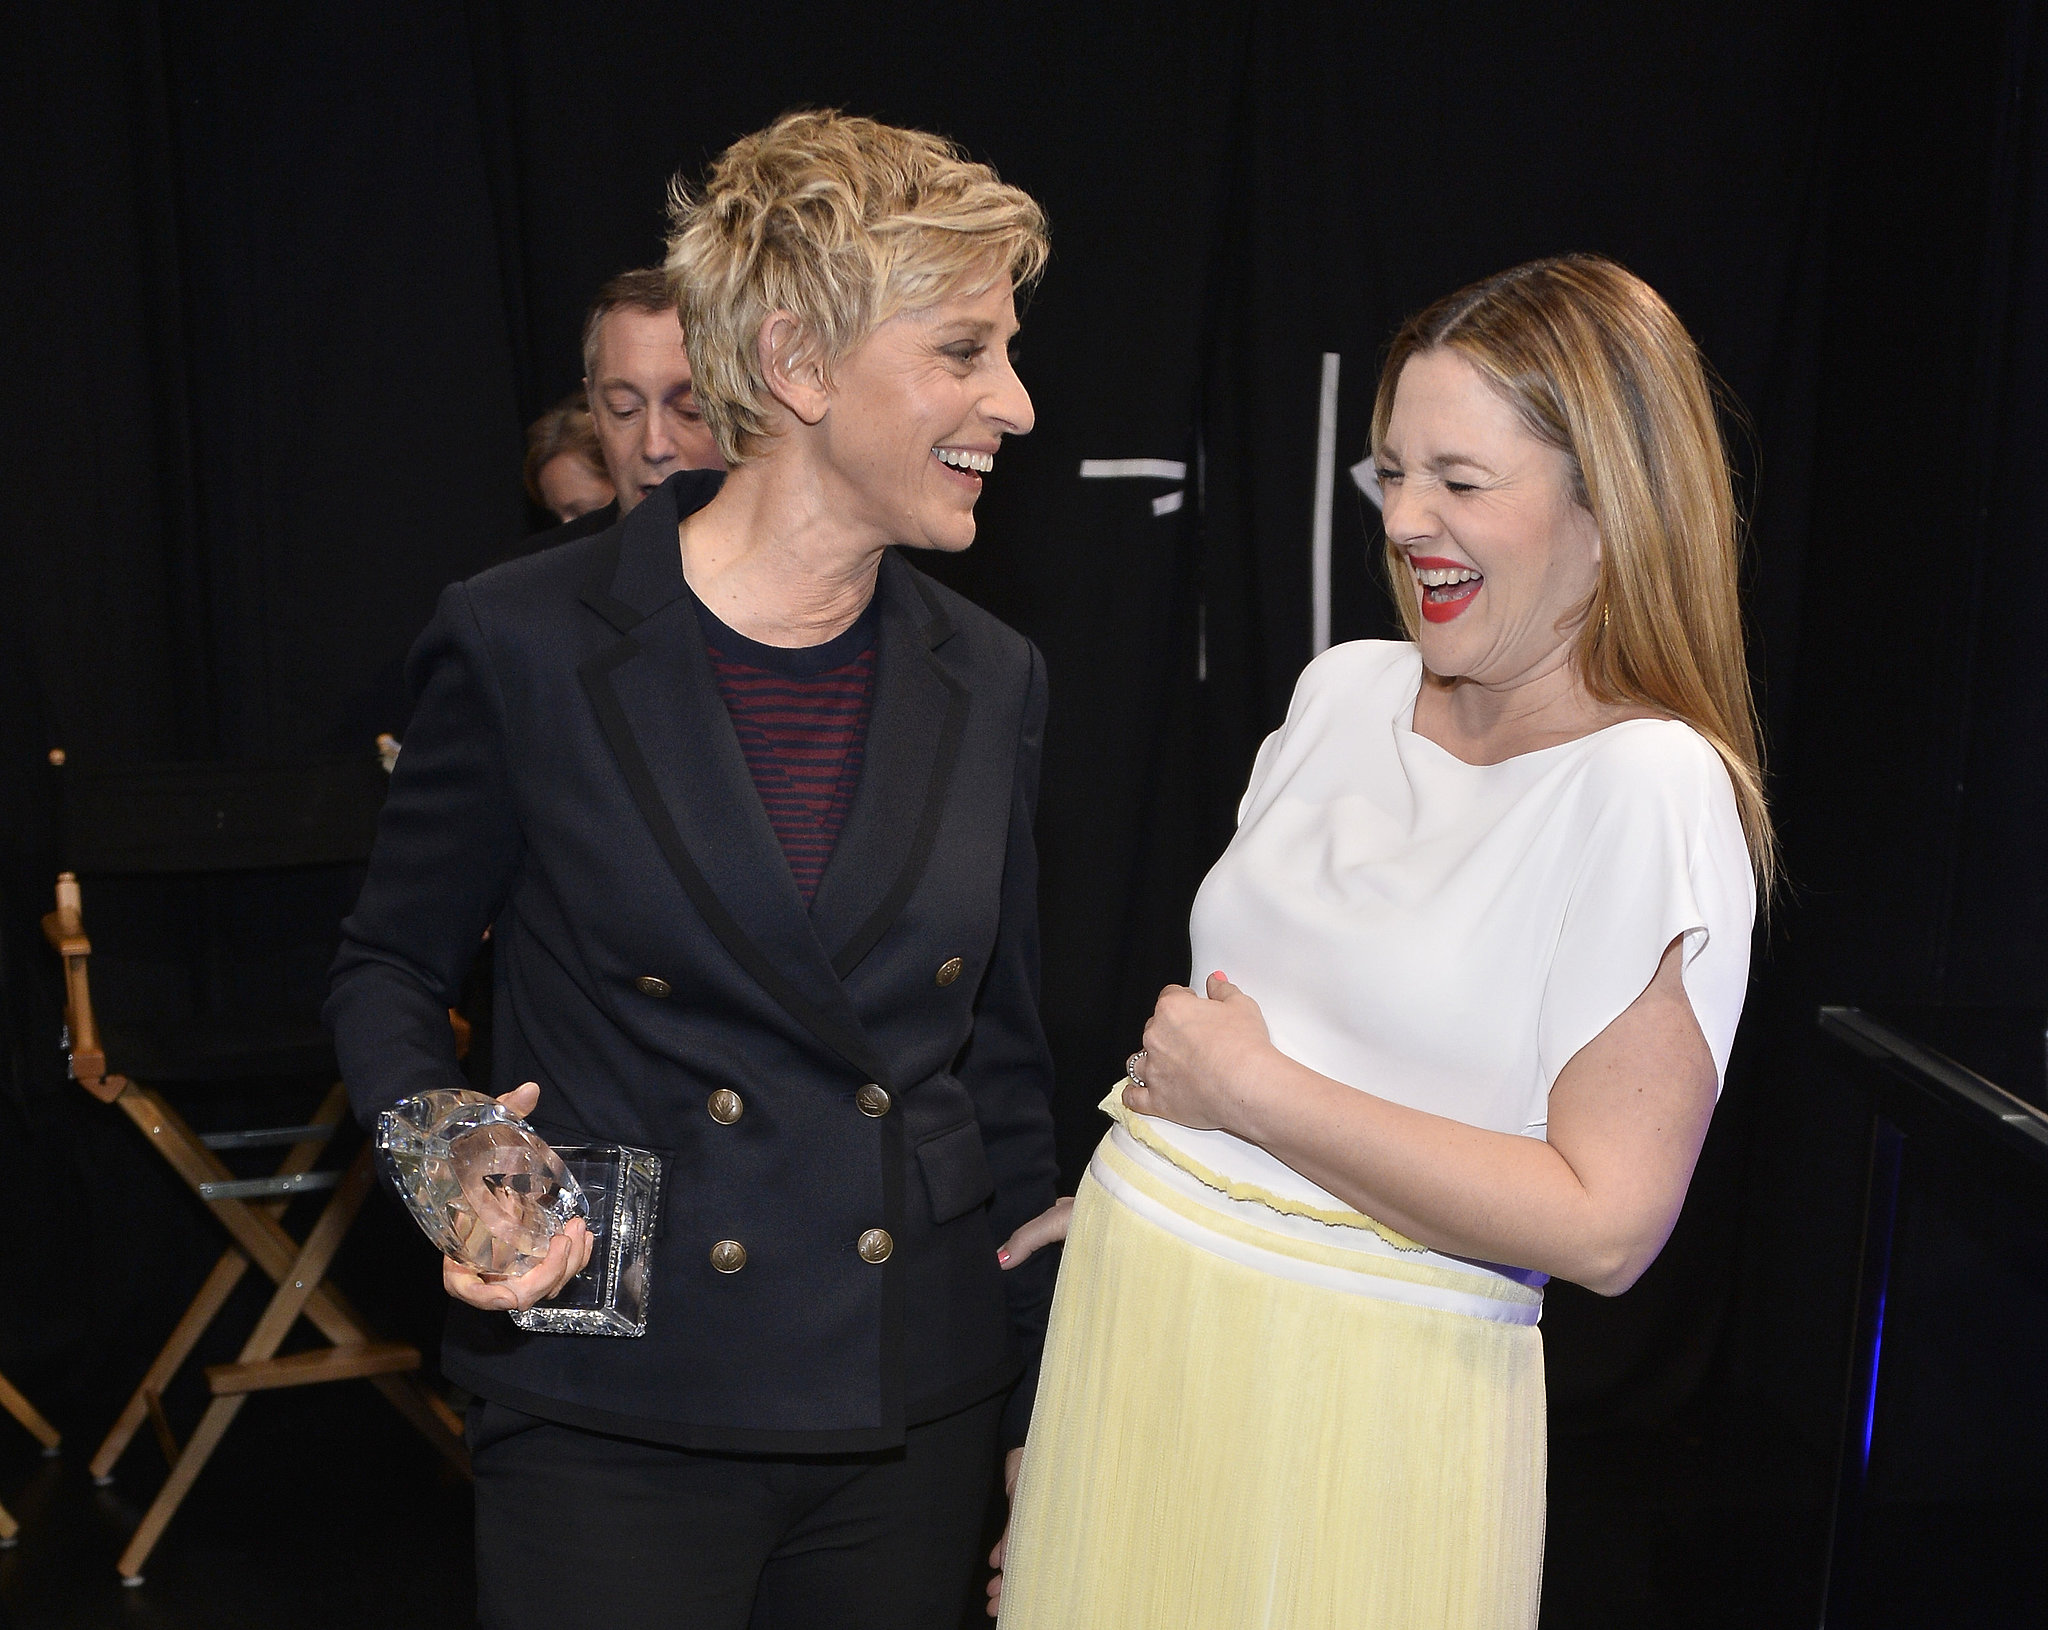 Drew Barrymore joked around with Ellen DeGeneres backstage, making for one adorable photo op.